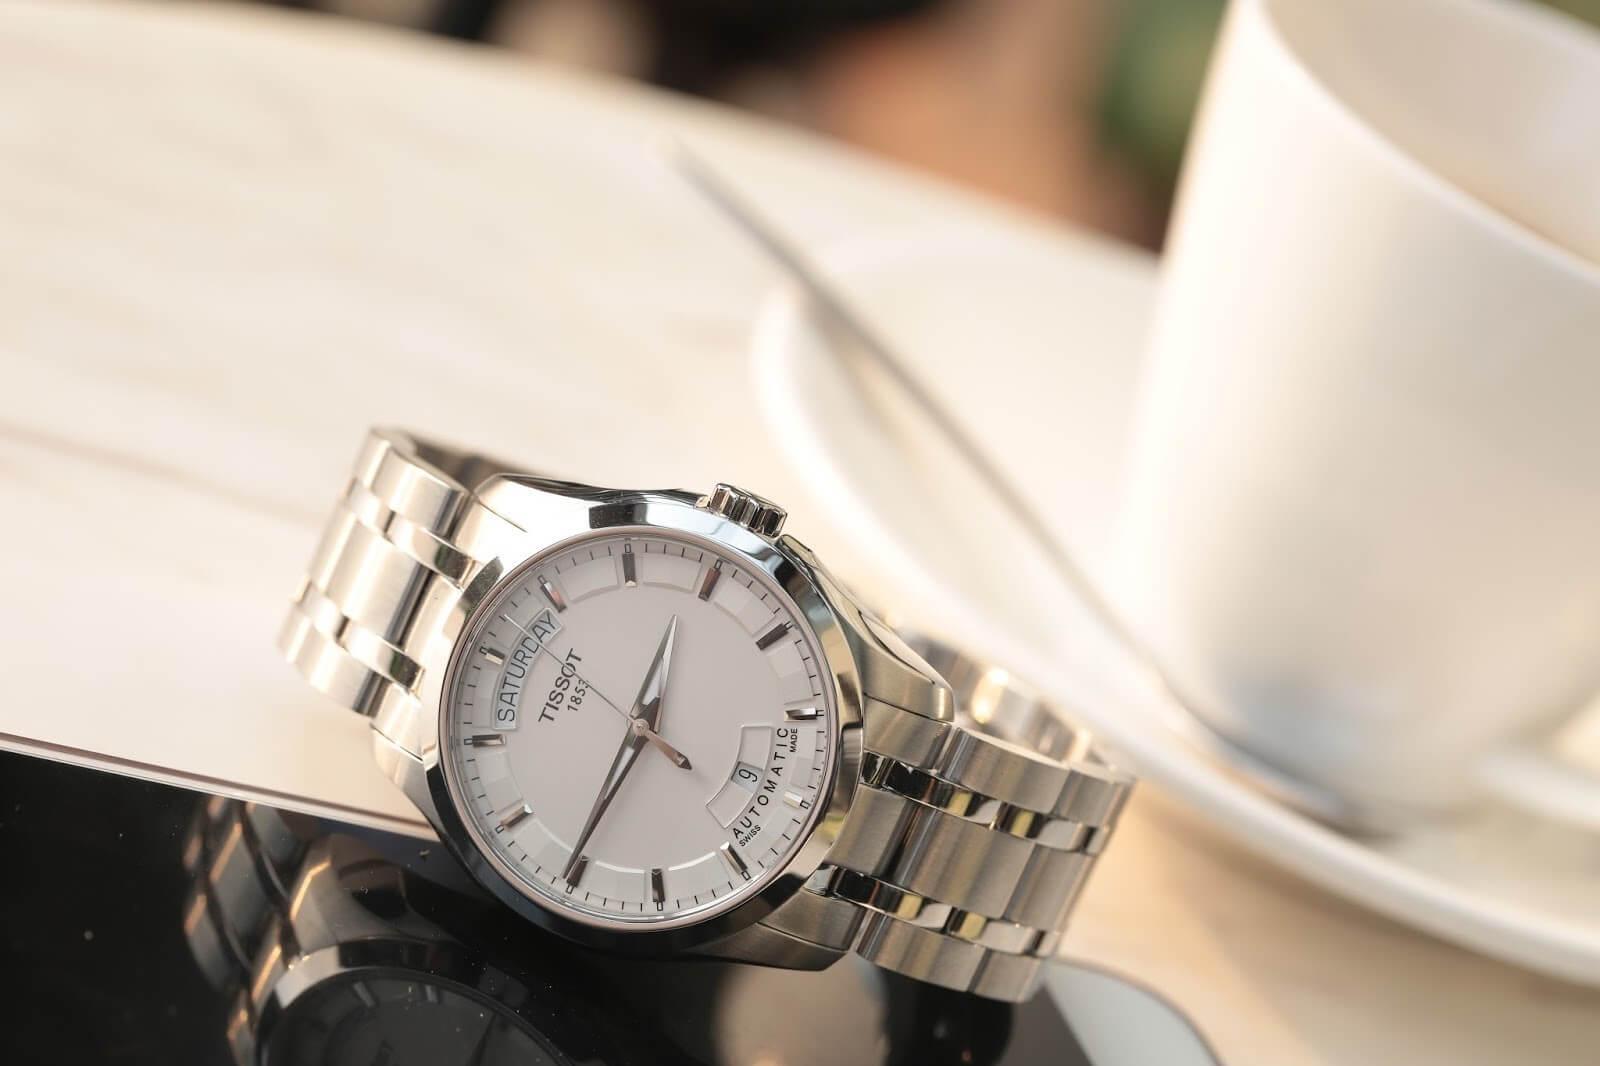 đồng hồ cao cấp